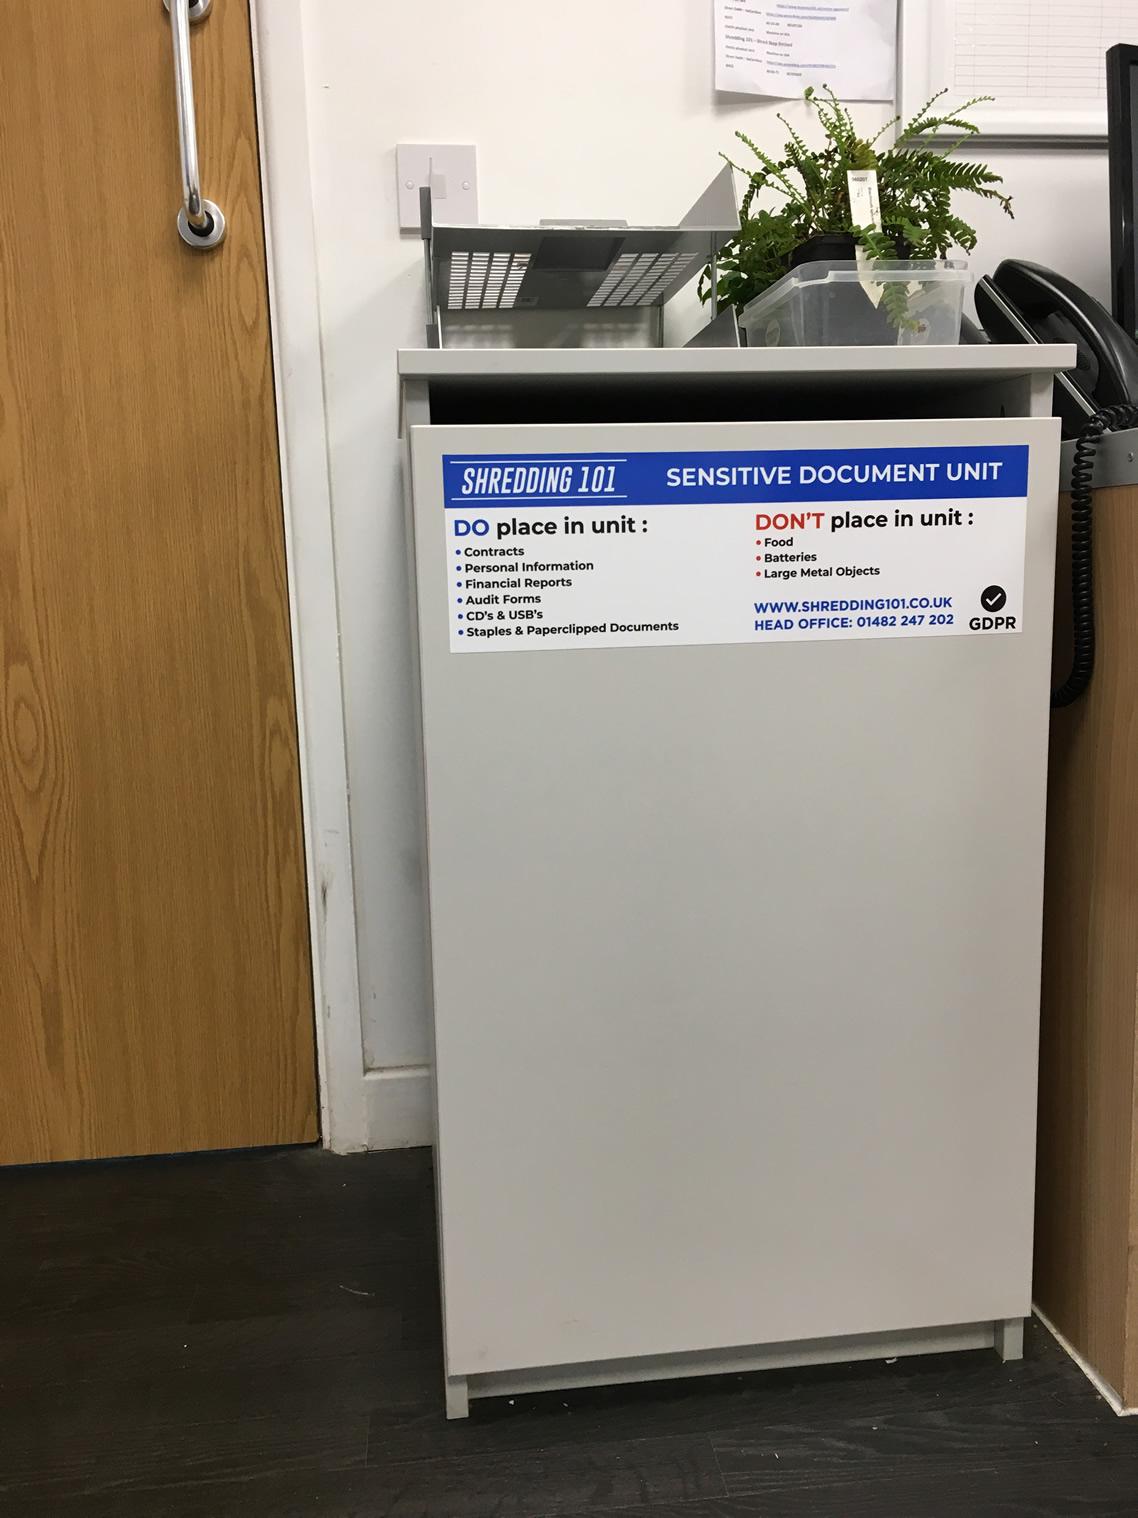 Paper document console for shredding destruction